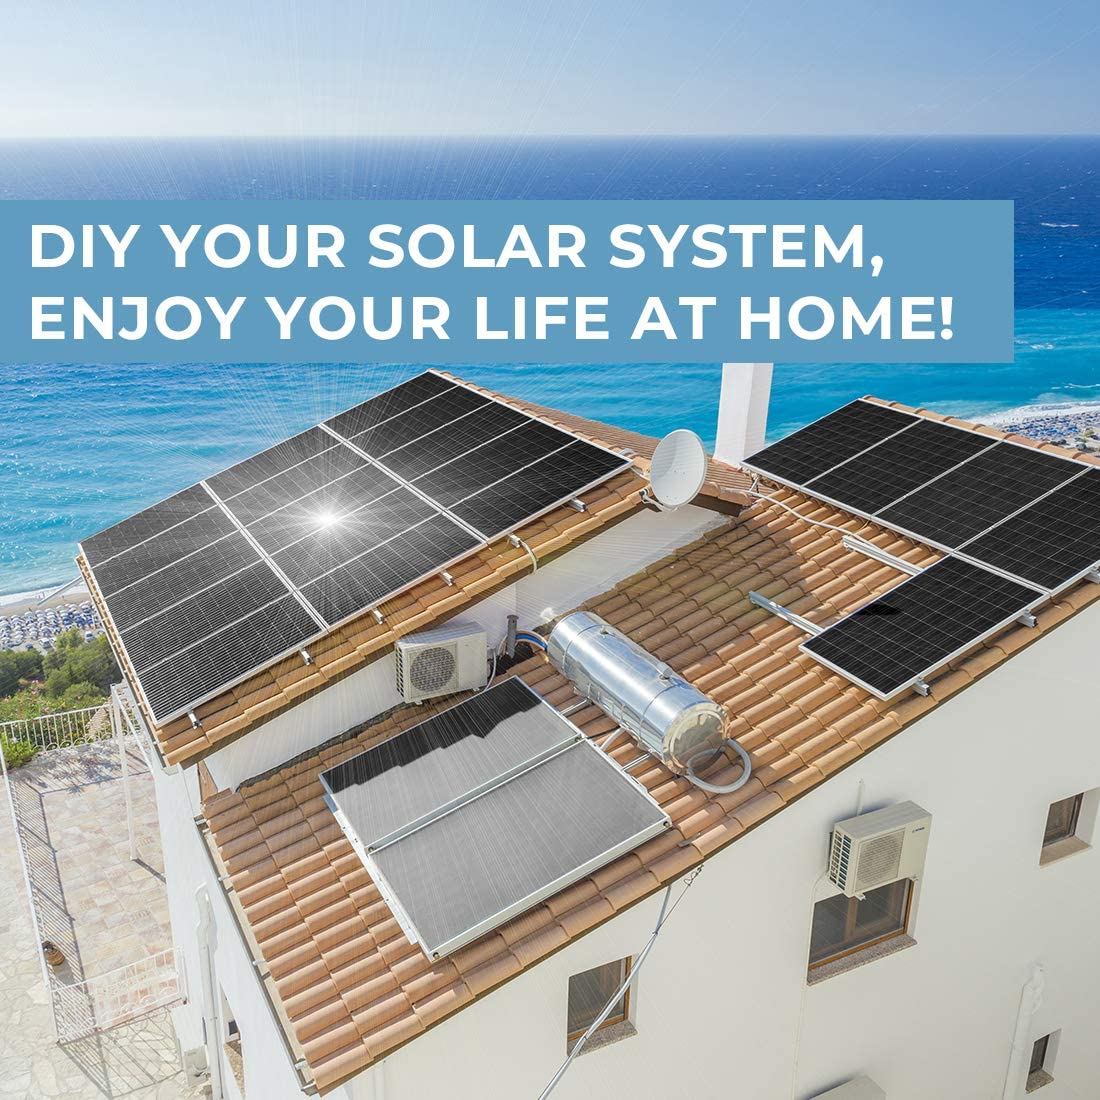 180 Watt solar panel by BourgeRV